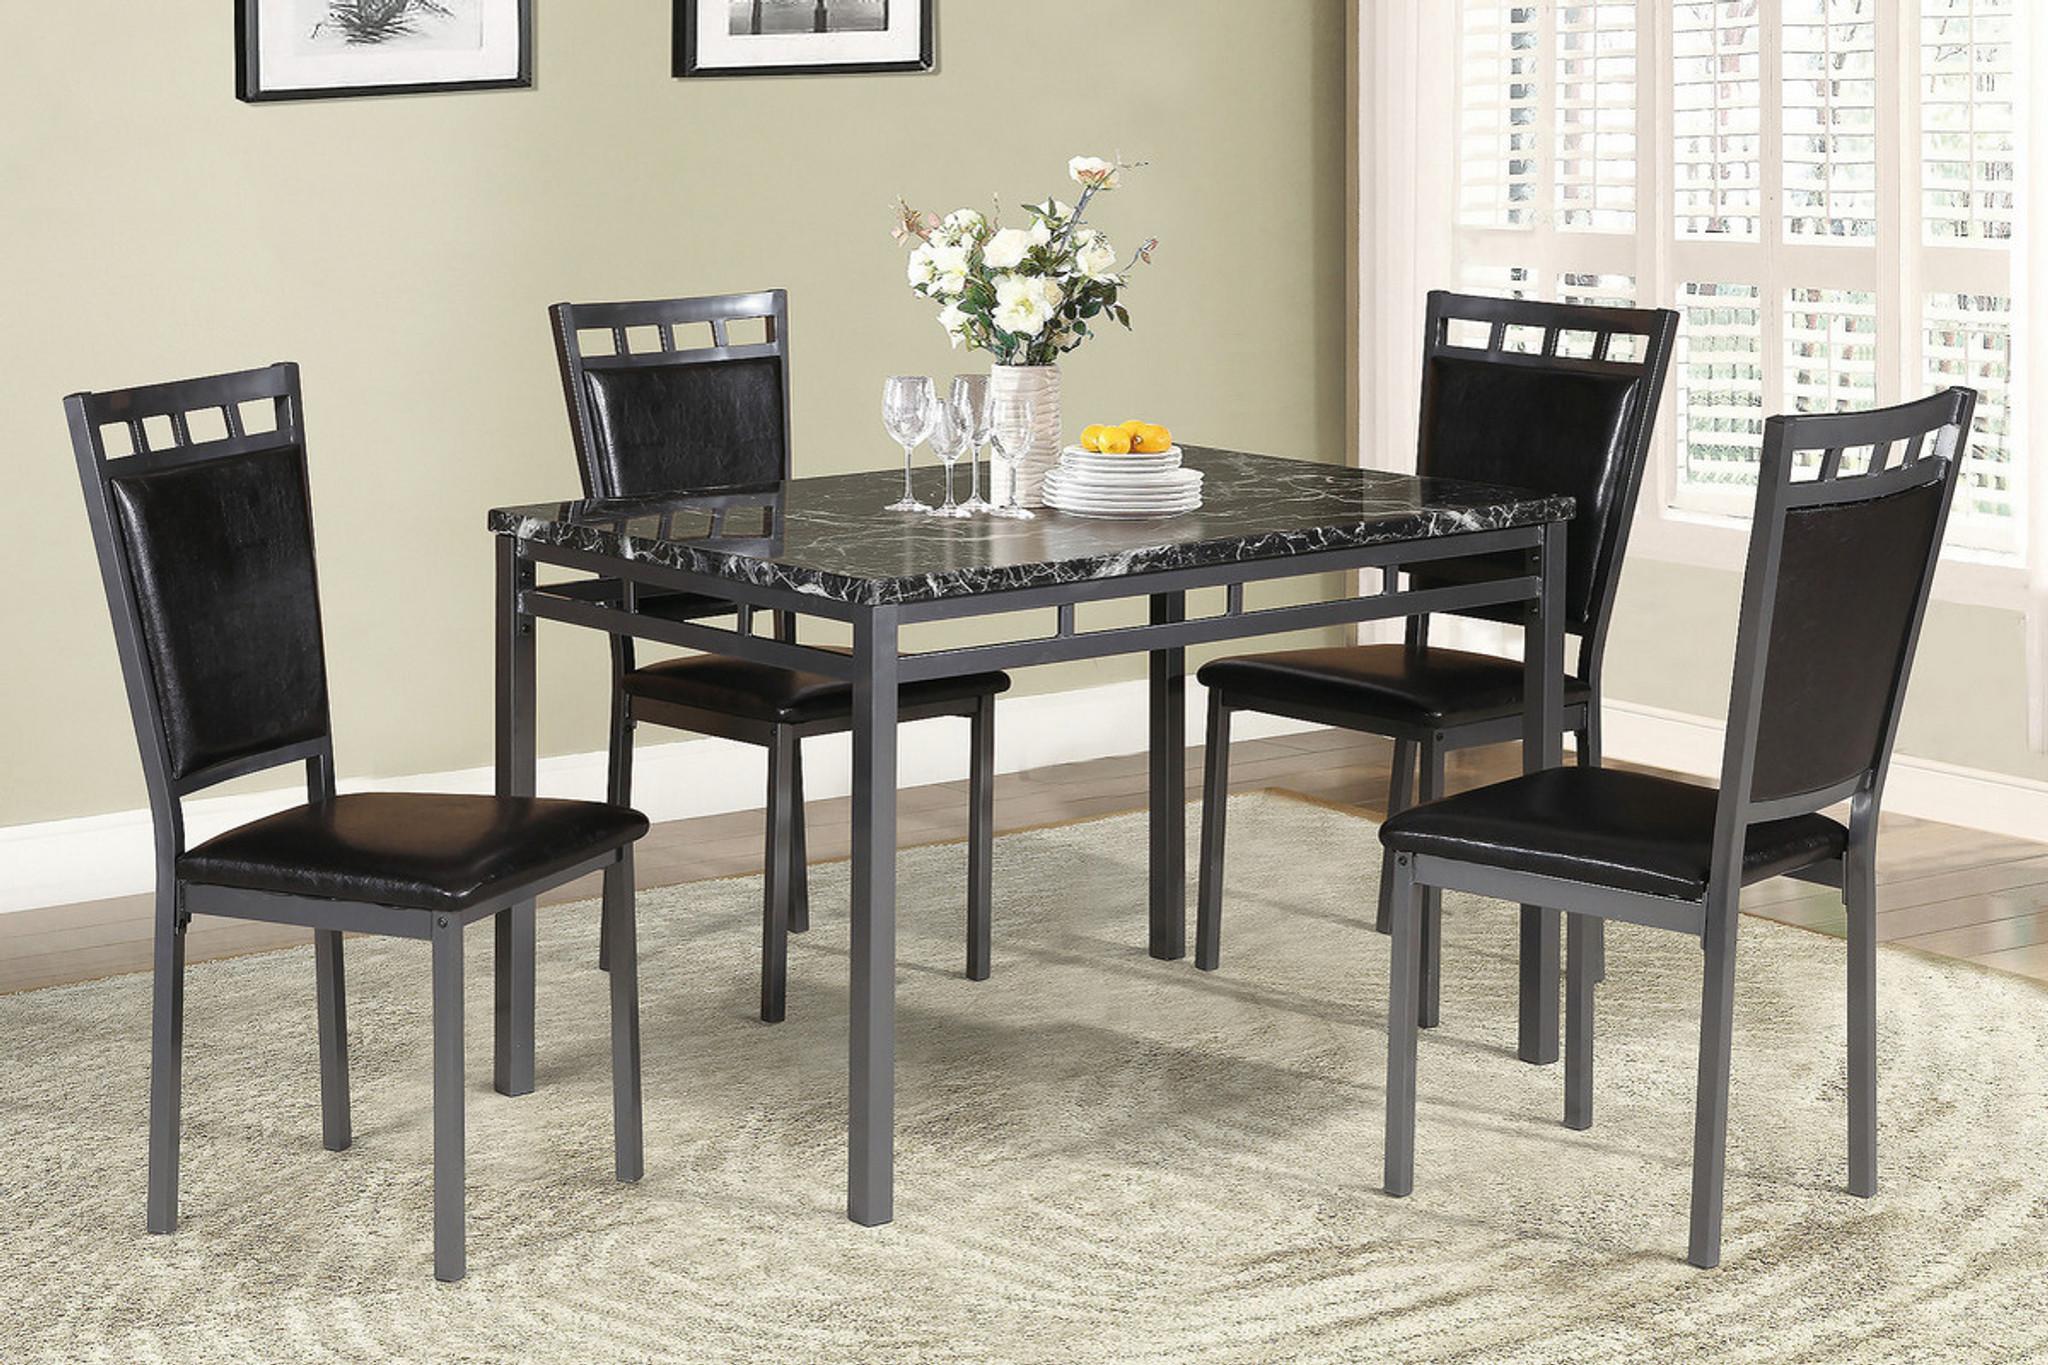 5PCS DINING TABLE SET ESPRESSO-F2389 & F2389-5PCS DINING TABLE SET ESPRESSO By Poundex